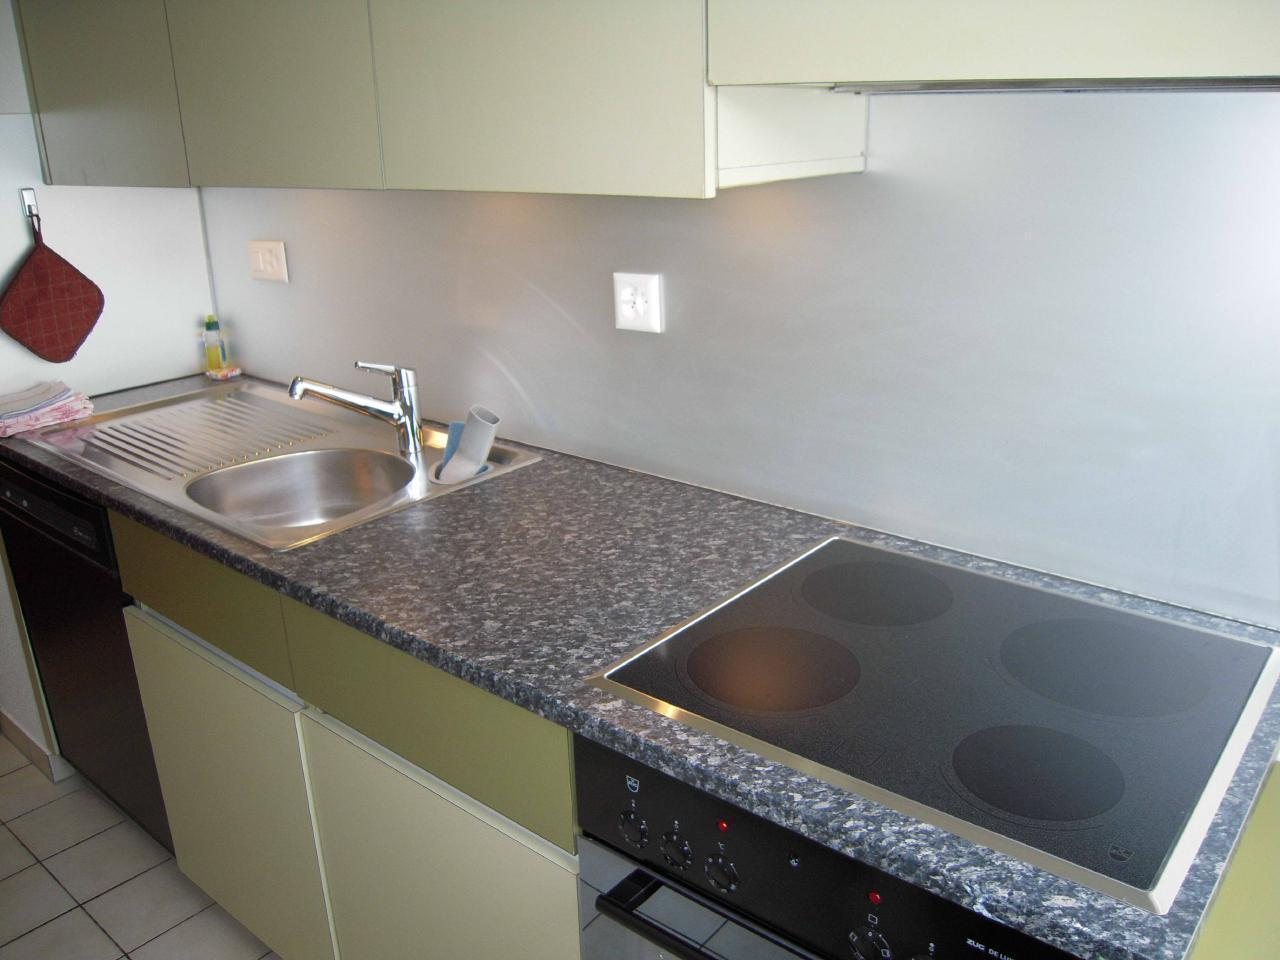 Holiday apartment Appartement Alpenblick / F5 (420340), Weggis, Weggis - Vitznau - Rigi, Central Switzerland, Switzerland, picture 7